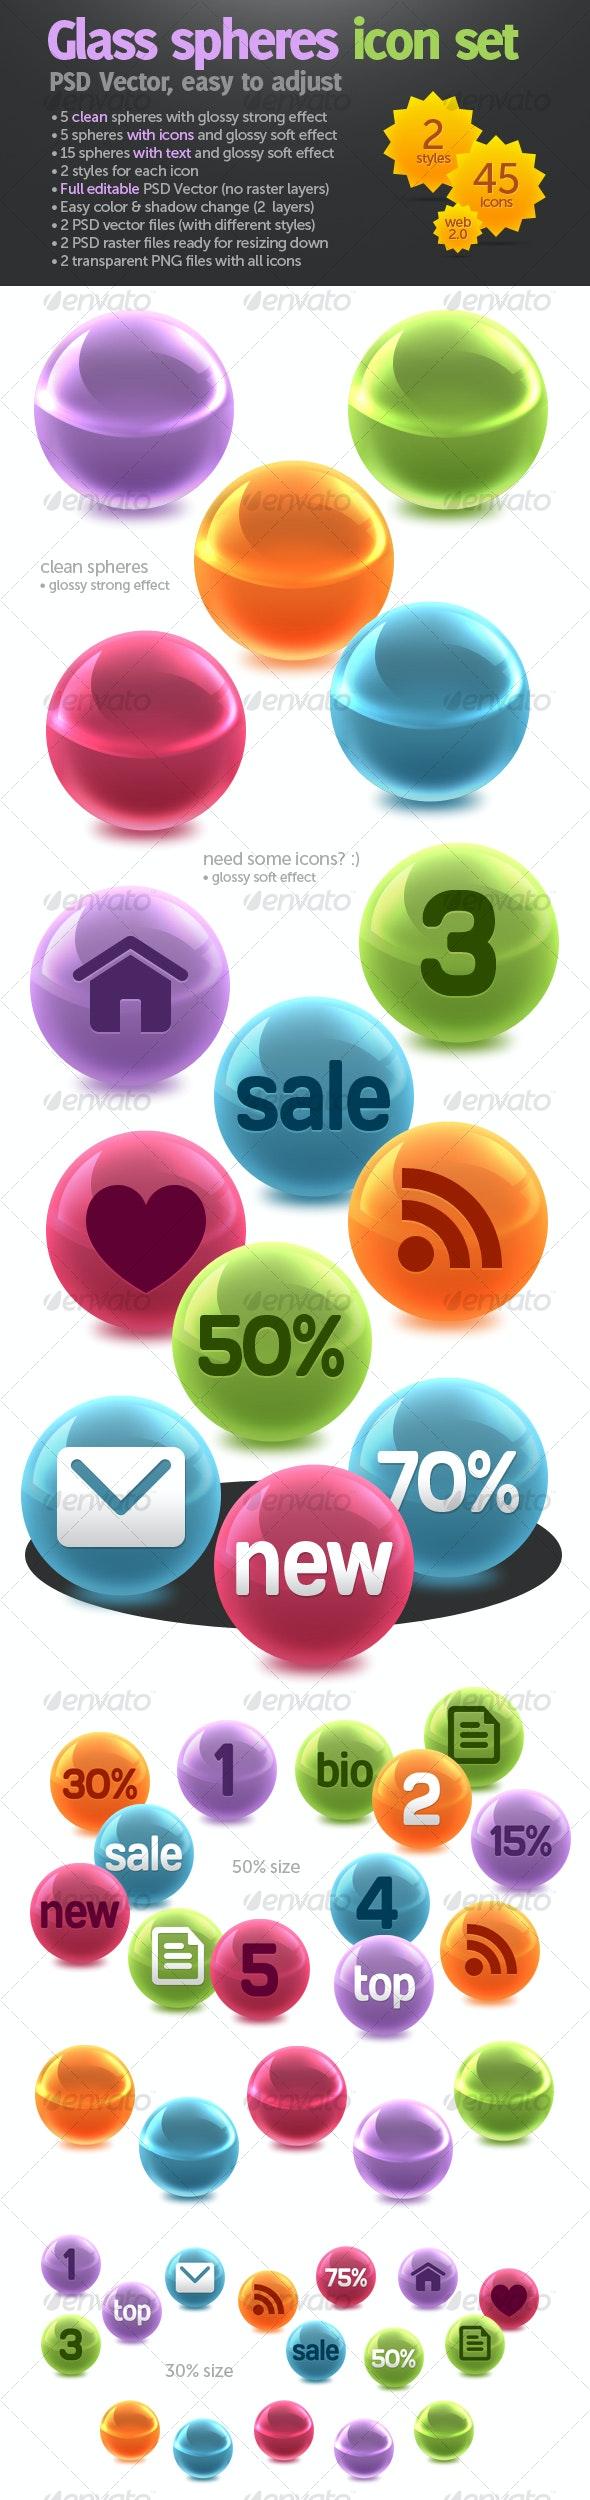 Glass spheres icon set - Web Icons